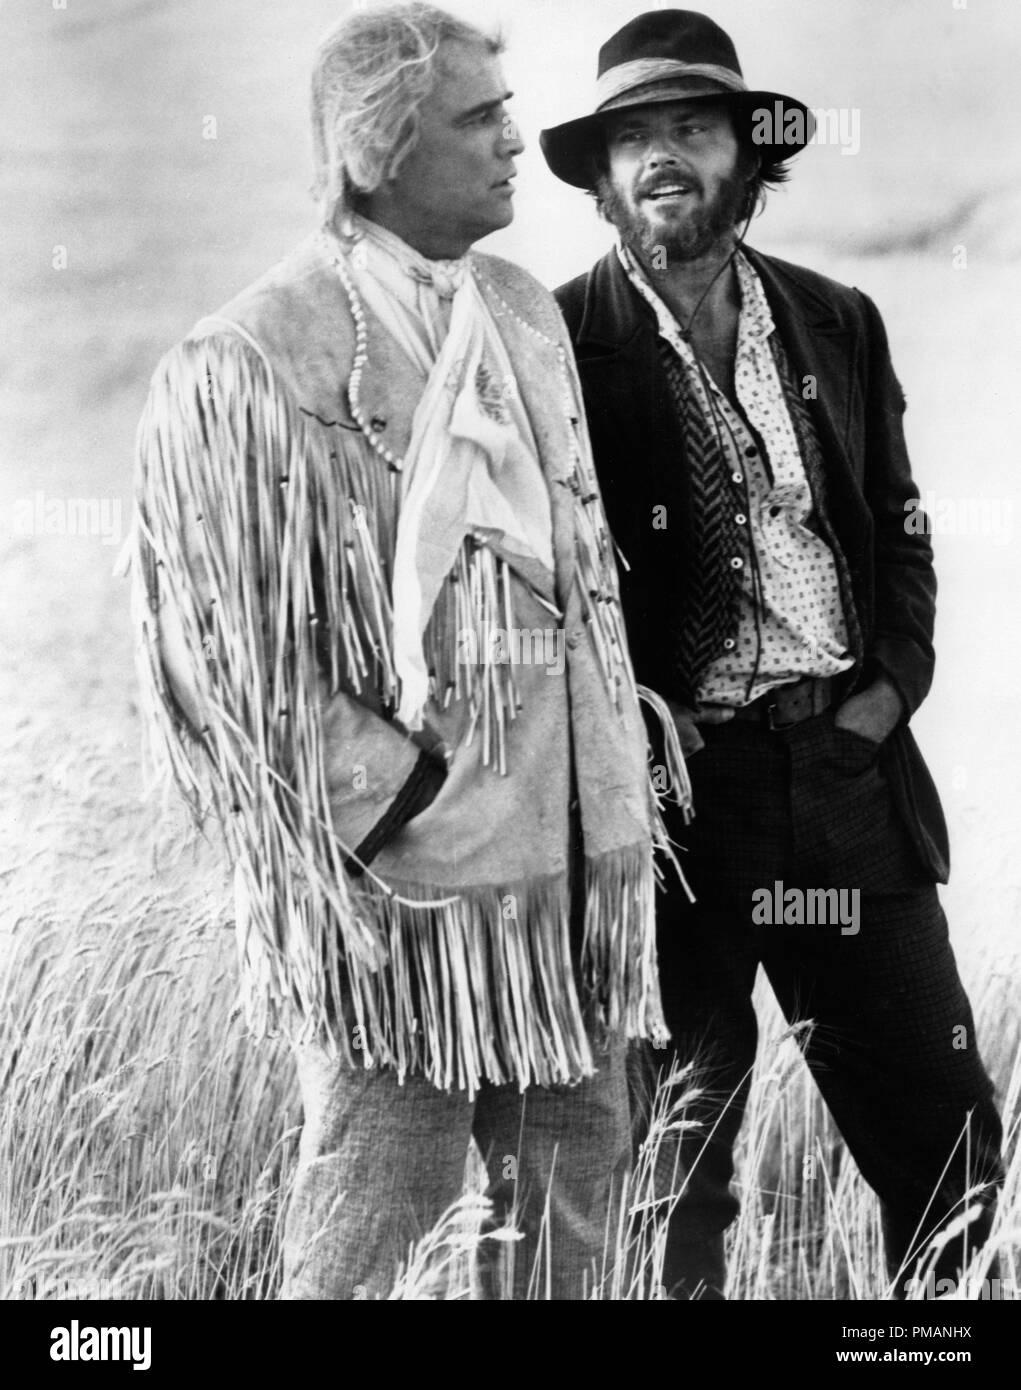 Studio Publicity Still: 'The Missouri Breaks'  Marlon Brando, Jack Nicholson  1976 United Artists     File Reference # 32039_141THA - Stock Image